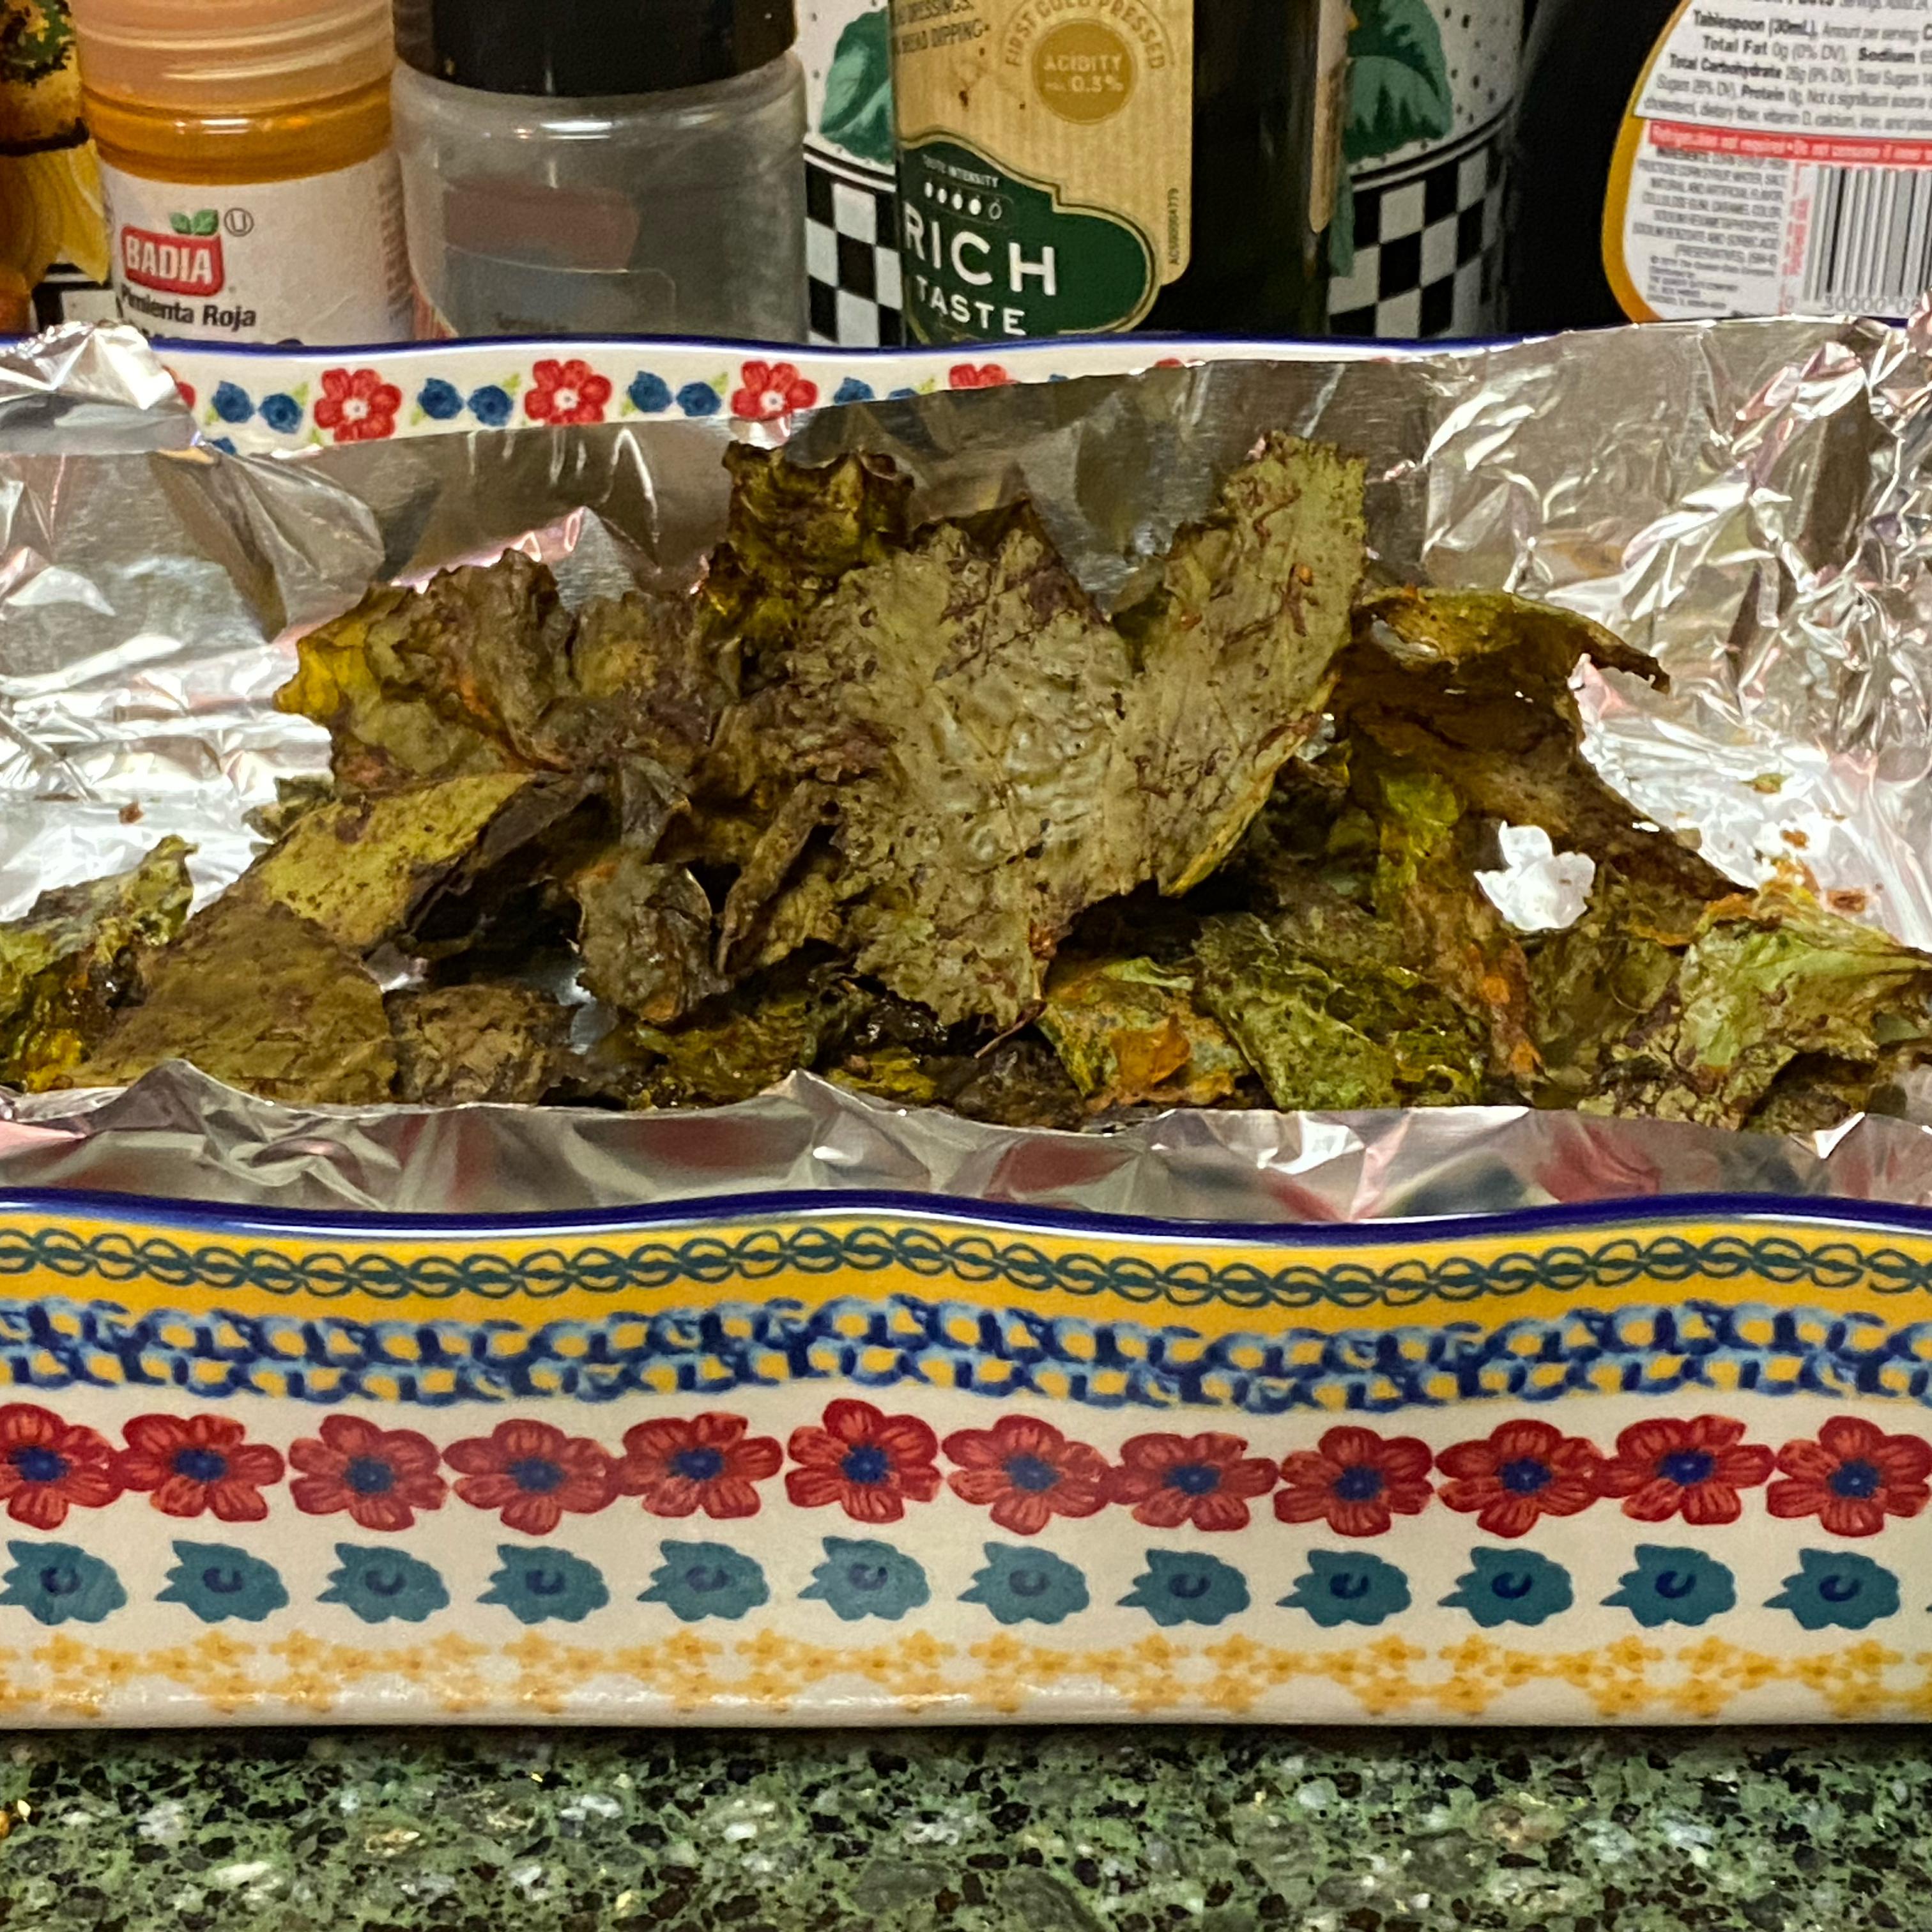 Air-Fried Kale Chips Patrick Cubel